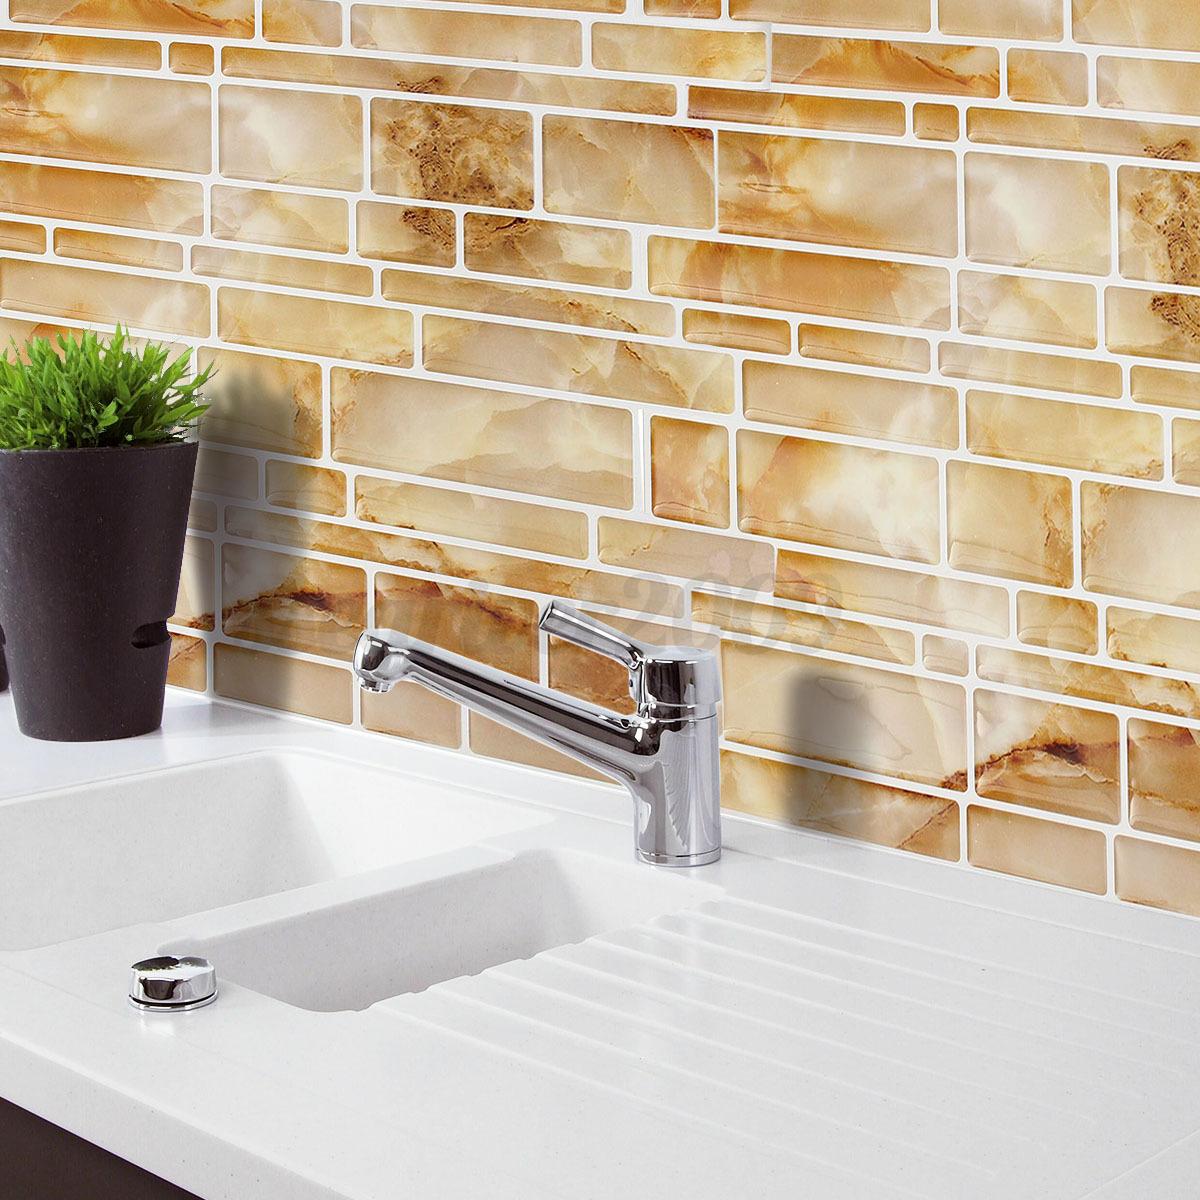 3d mosaic tile modern wallpaper foil sticker bathroom kitchen home